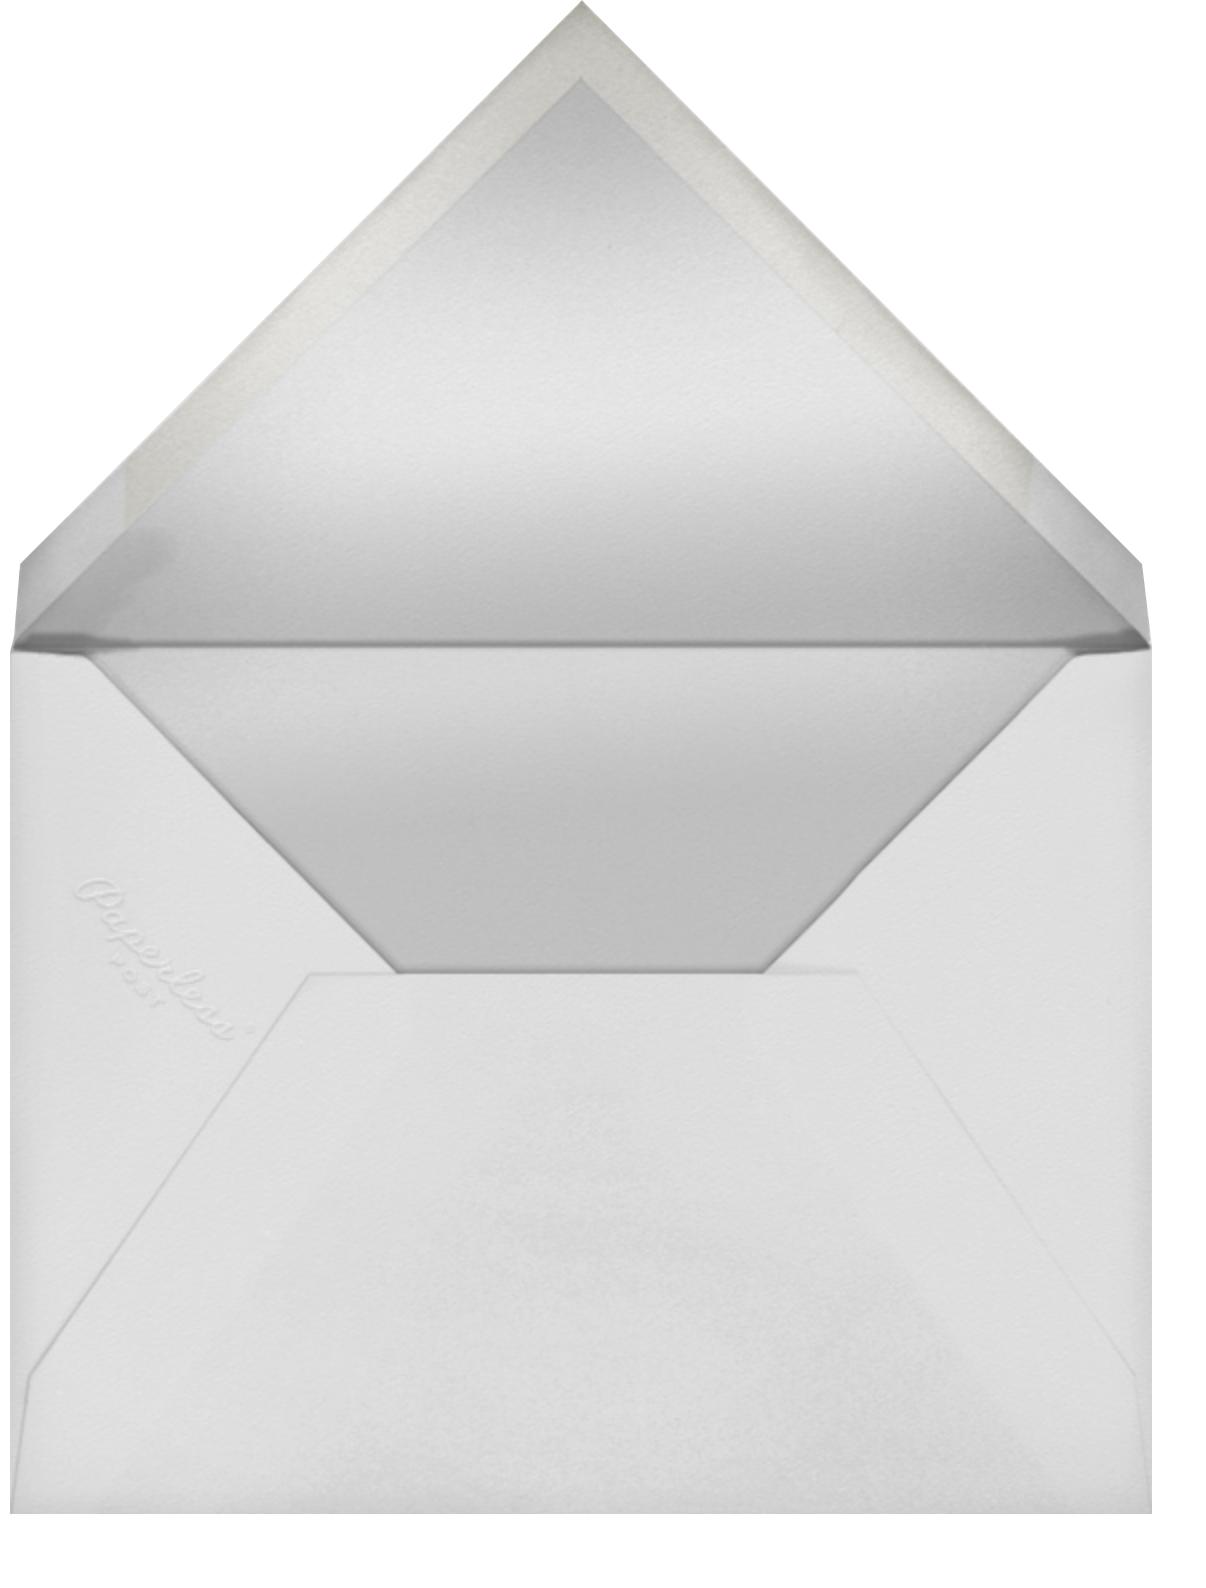 Mr. Hollywood (Program) - Mr. Boddington's Studio - Menus and programs - envelope back